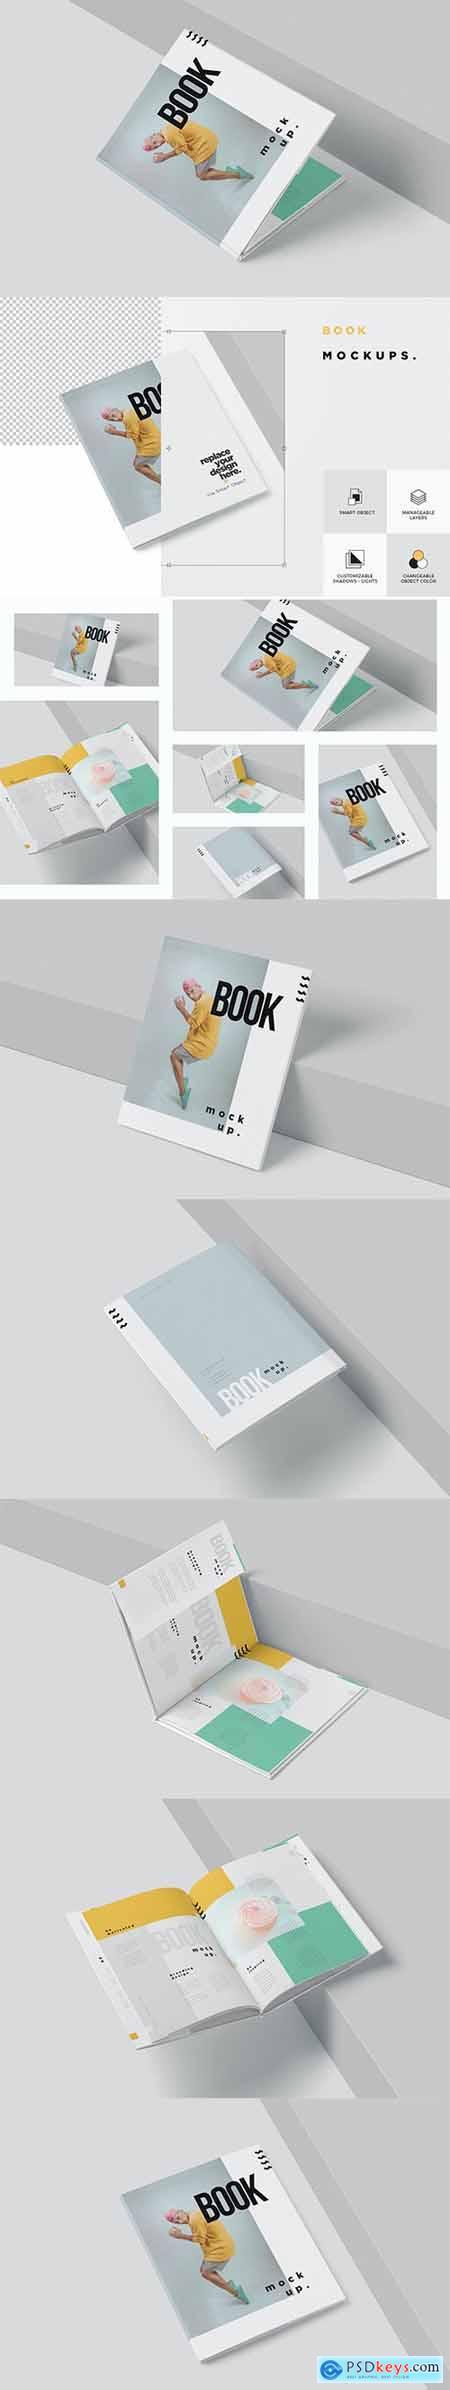 Hardback Book Mockups